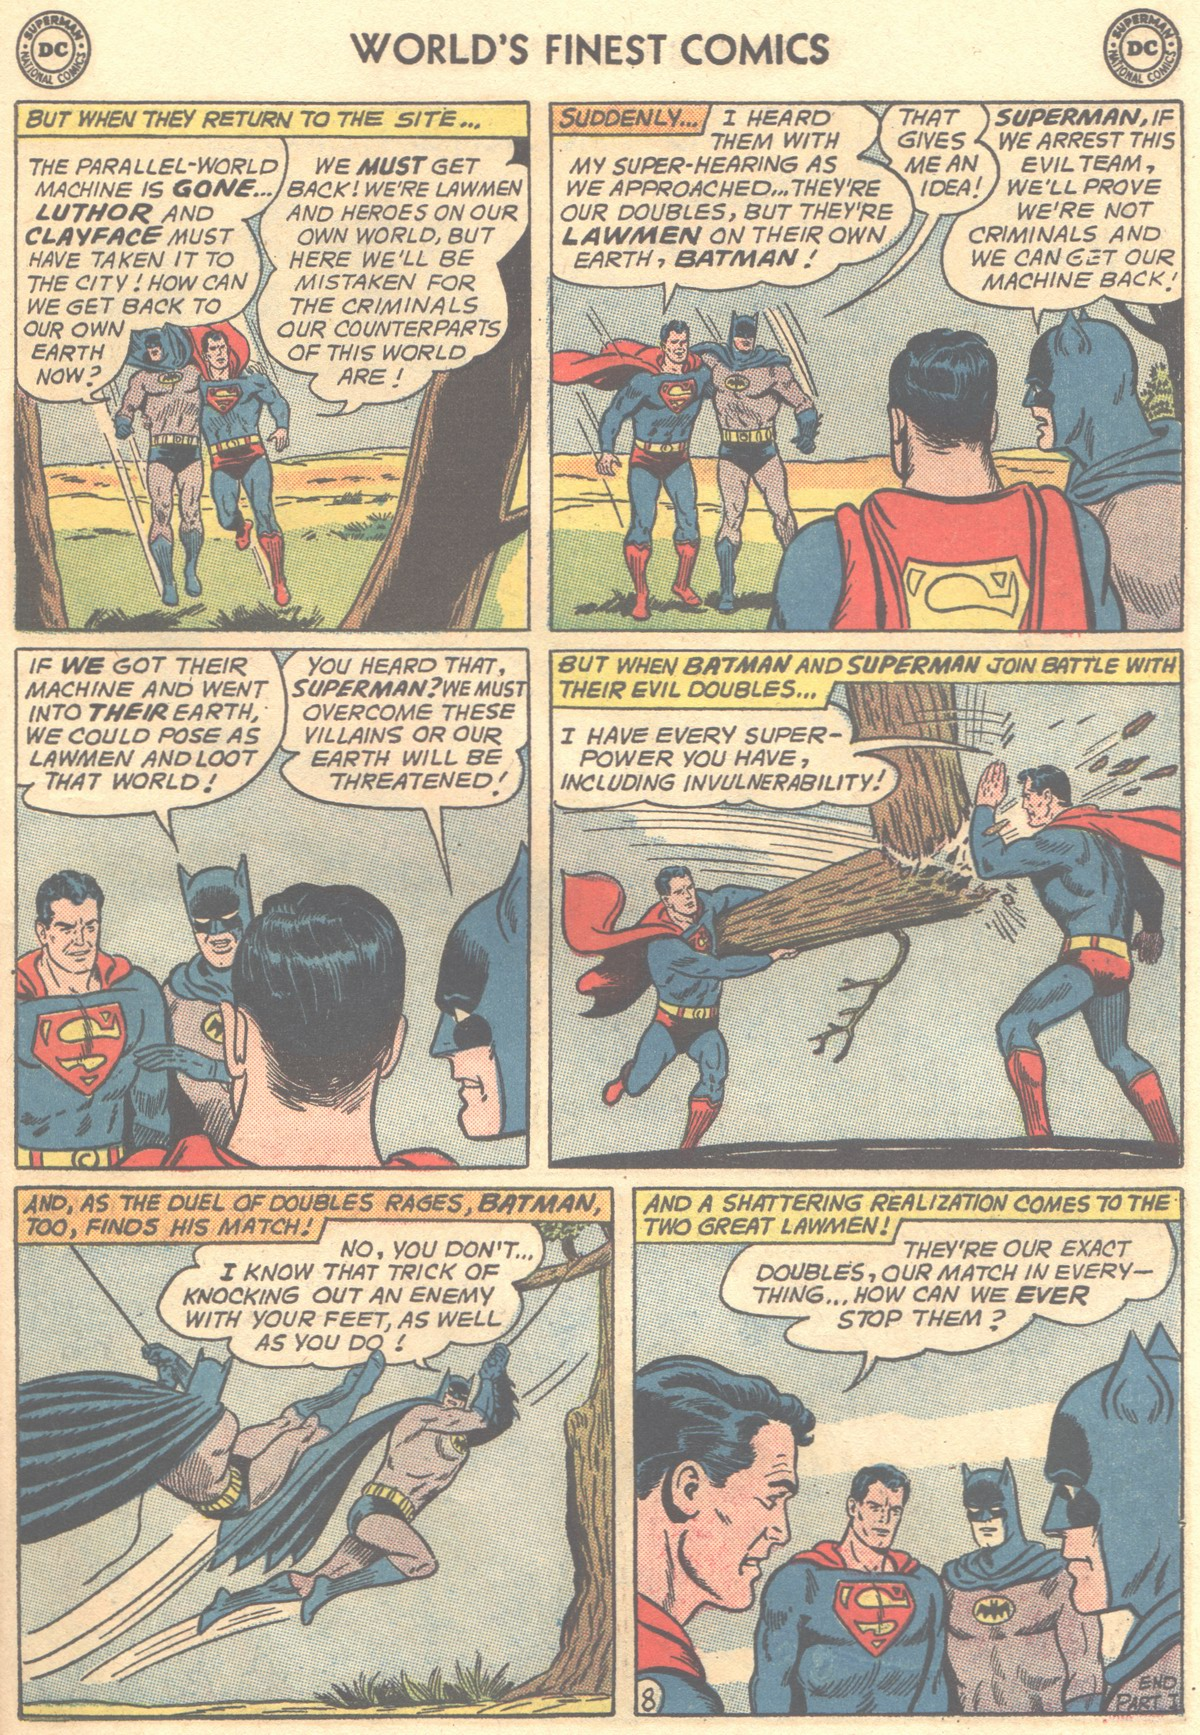 Read online World's Finest Comics comic -  Issue #148 - 11